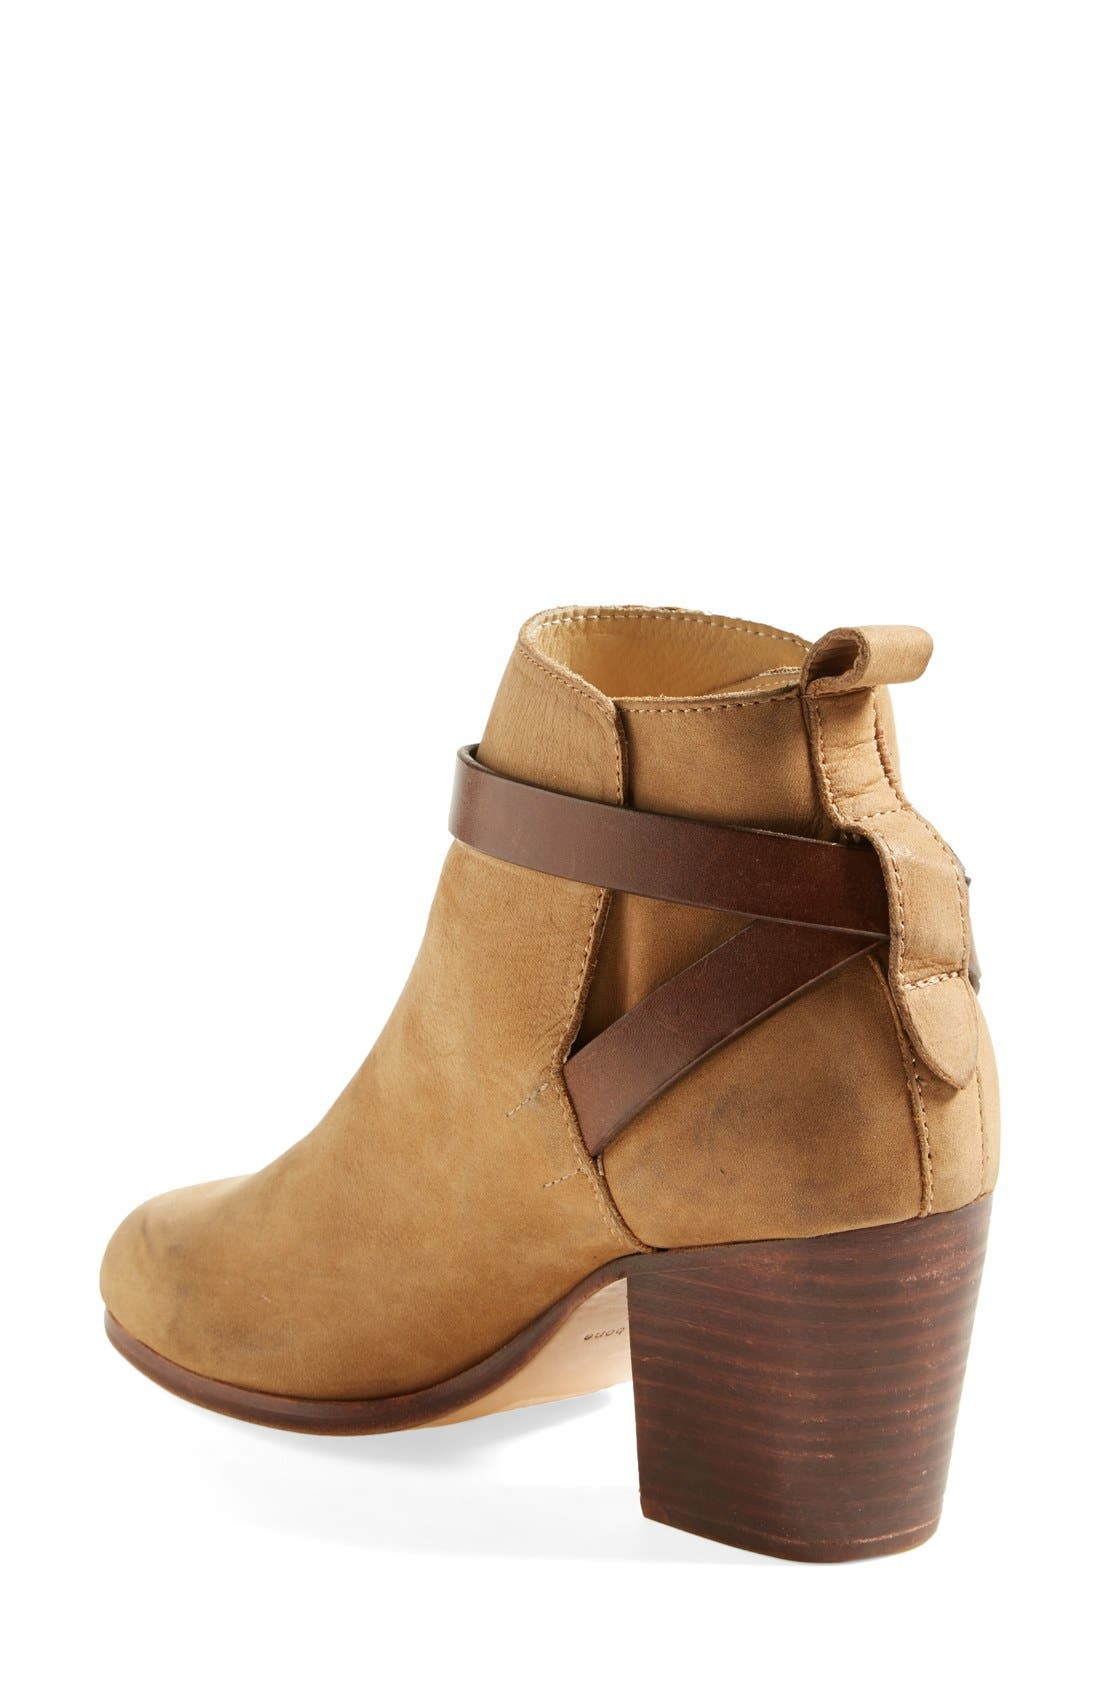 Alternate Image 2  - rag & bone 'Dalton' Boot (Women)